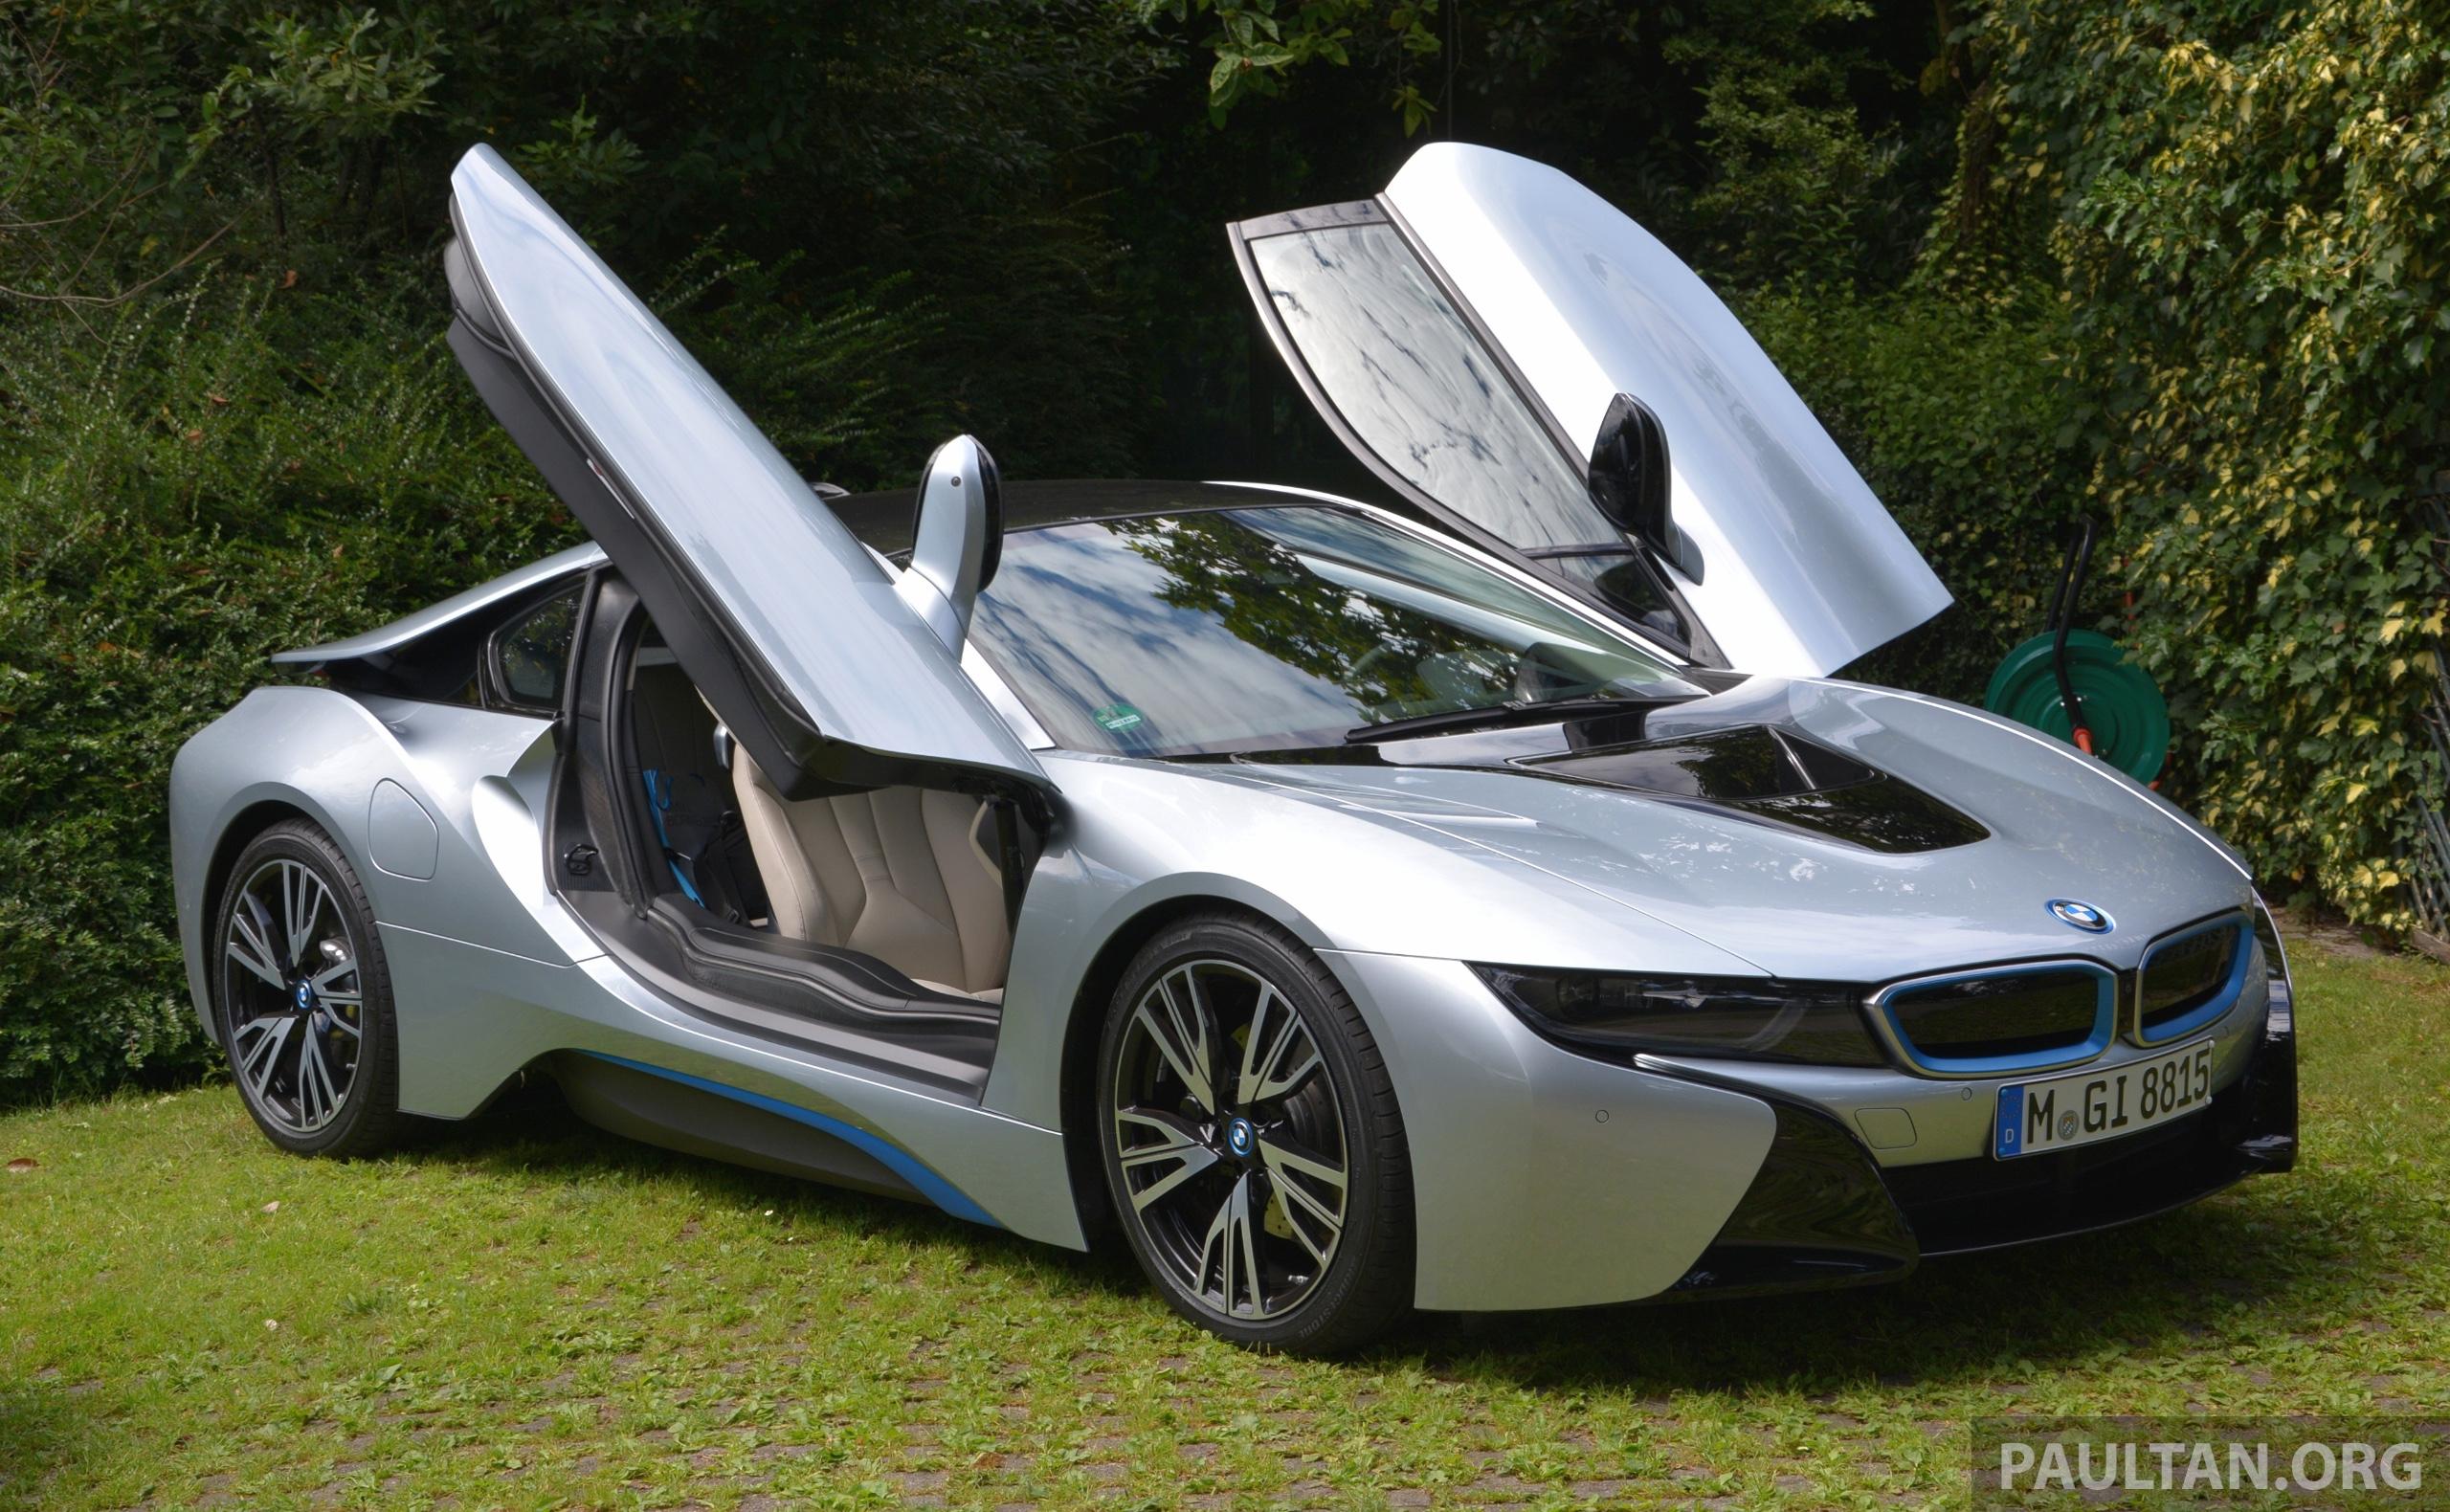 Driven Bmw I8 Plug In Hybrid Sports Car In Milan Image 329789